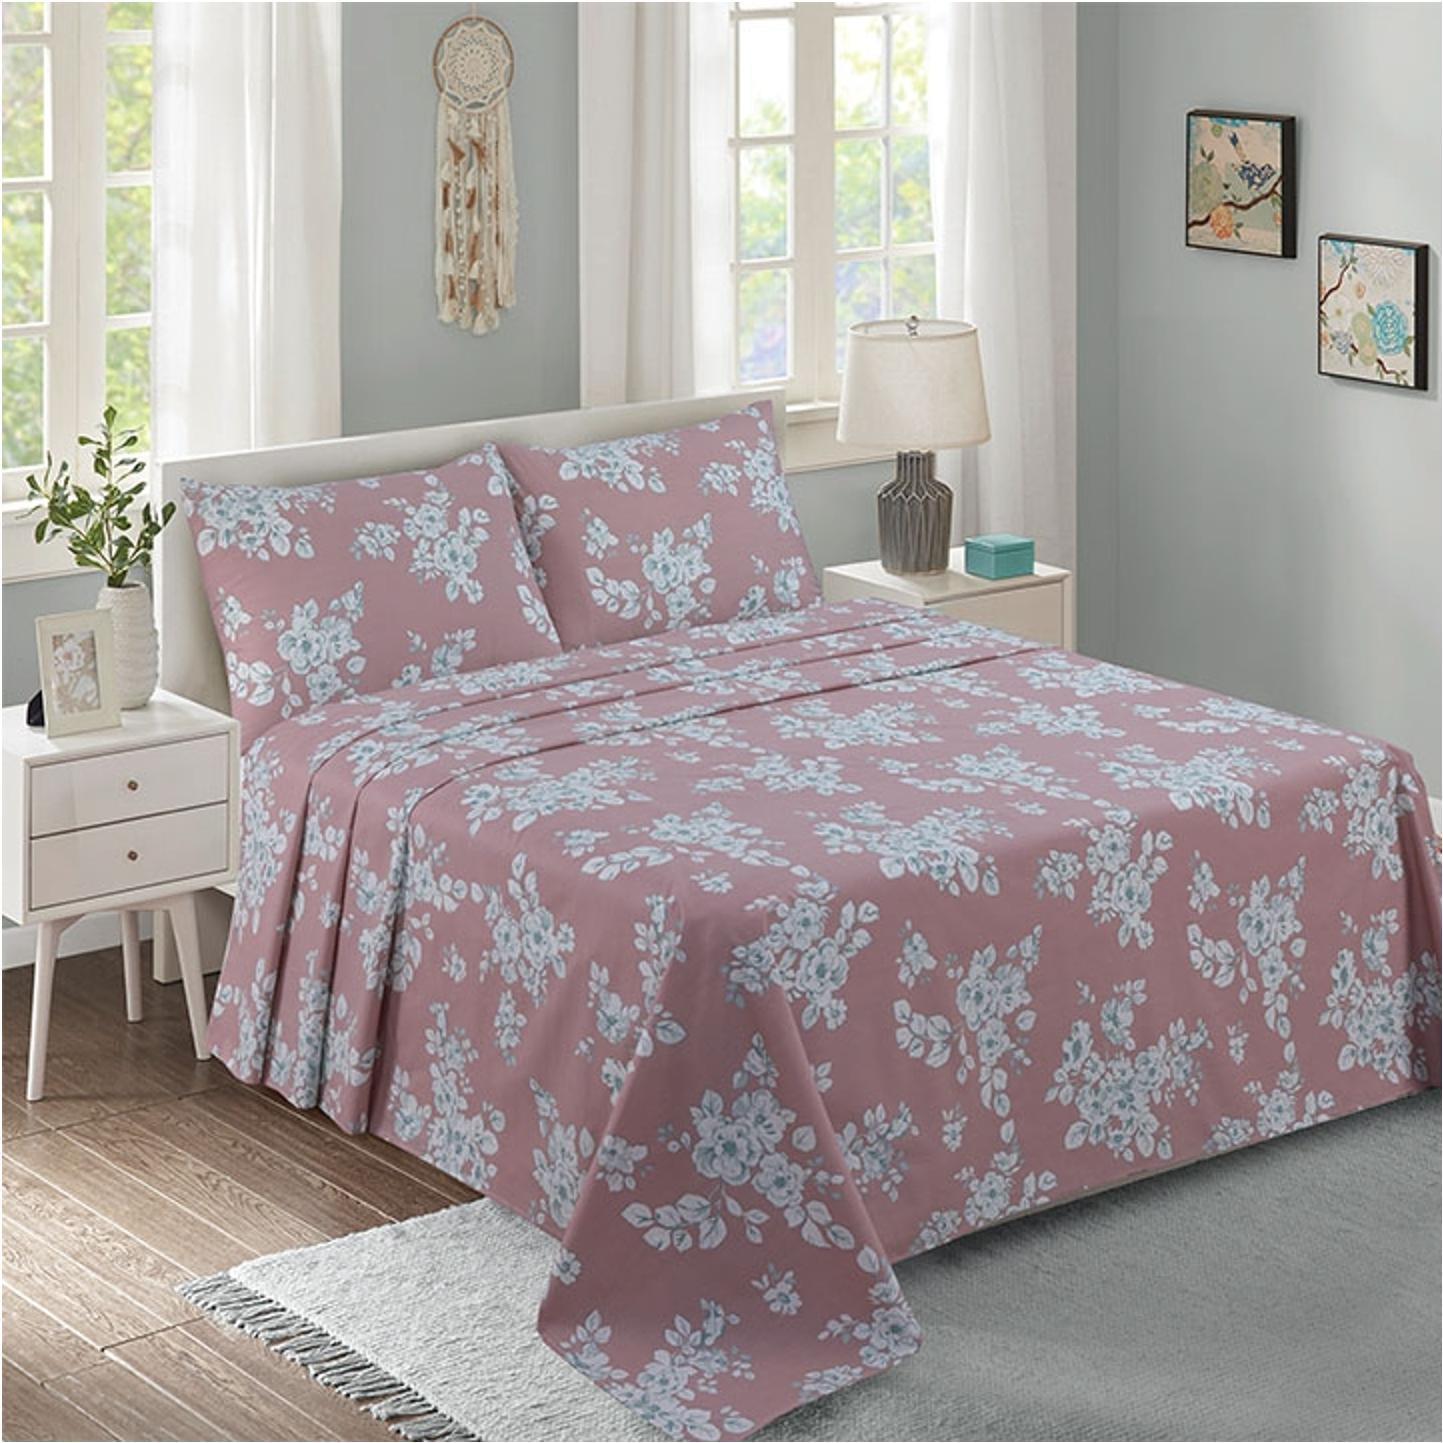 Lino Home Παπλωματοθηκη Υπέρδιπλες 220×240 Polp Pink